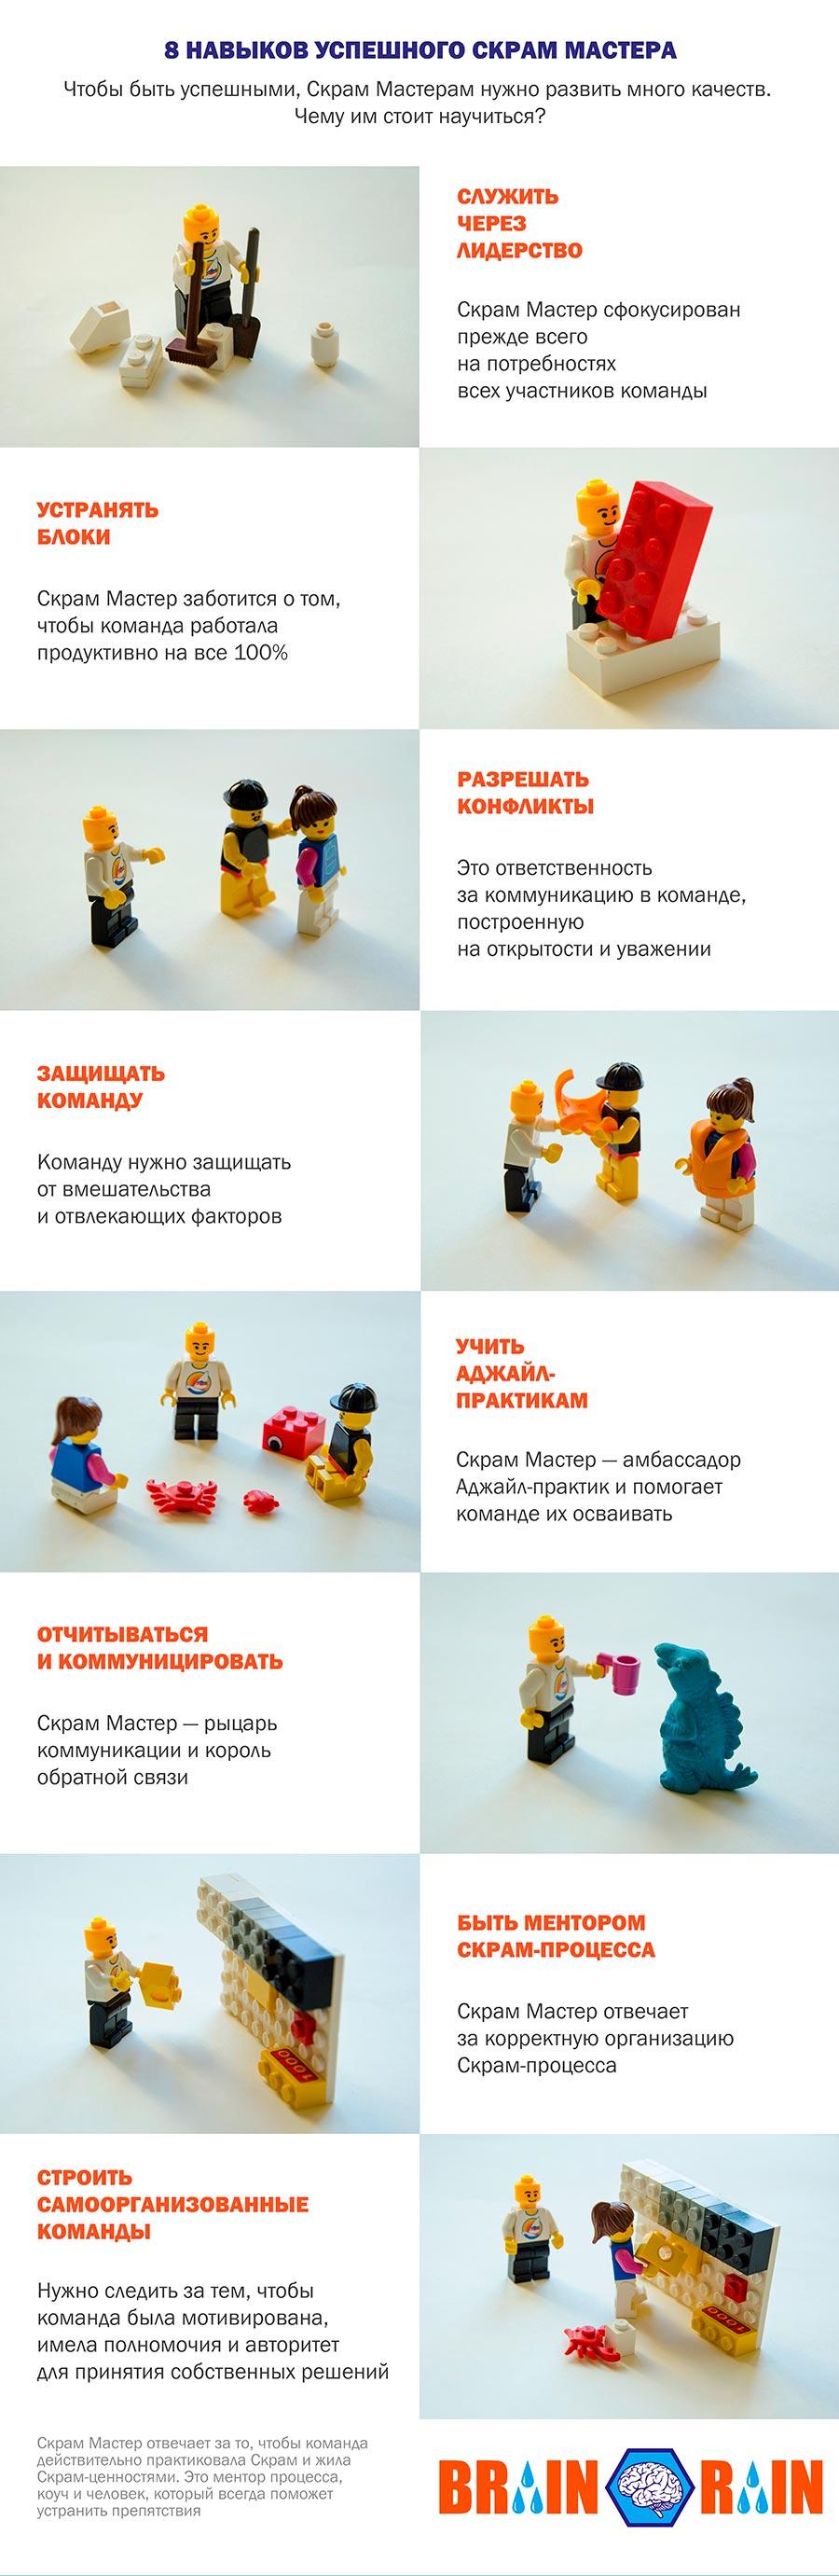 Навыки успешного Скрам Мастера - инфографика